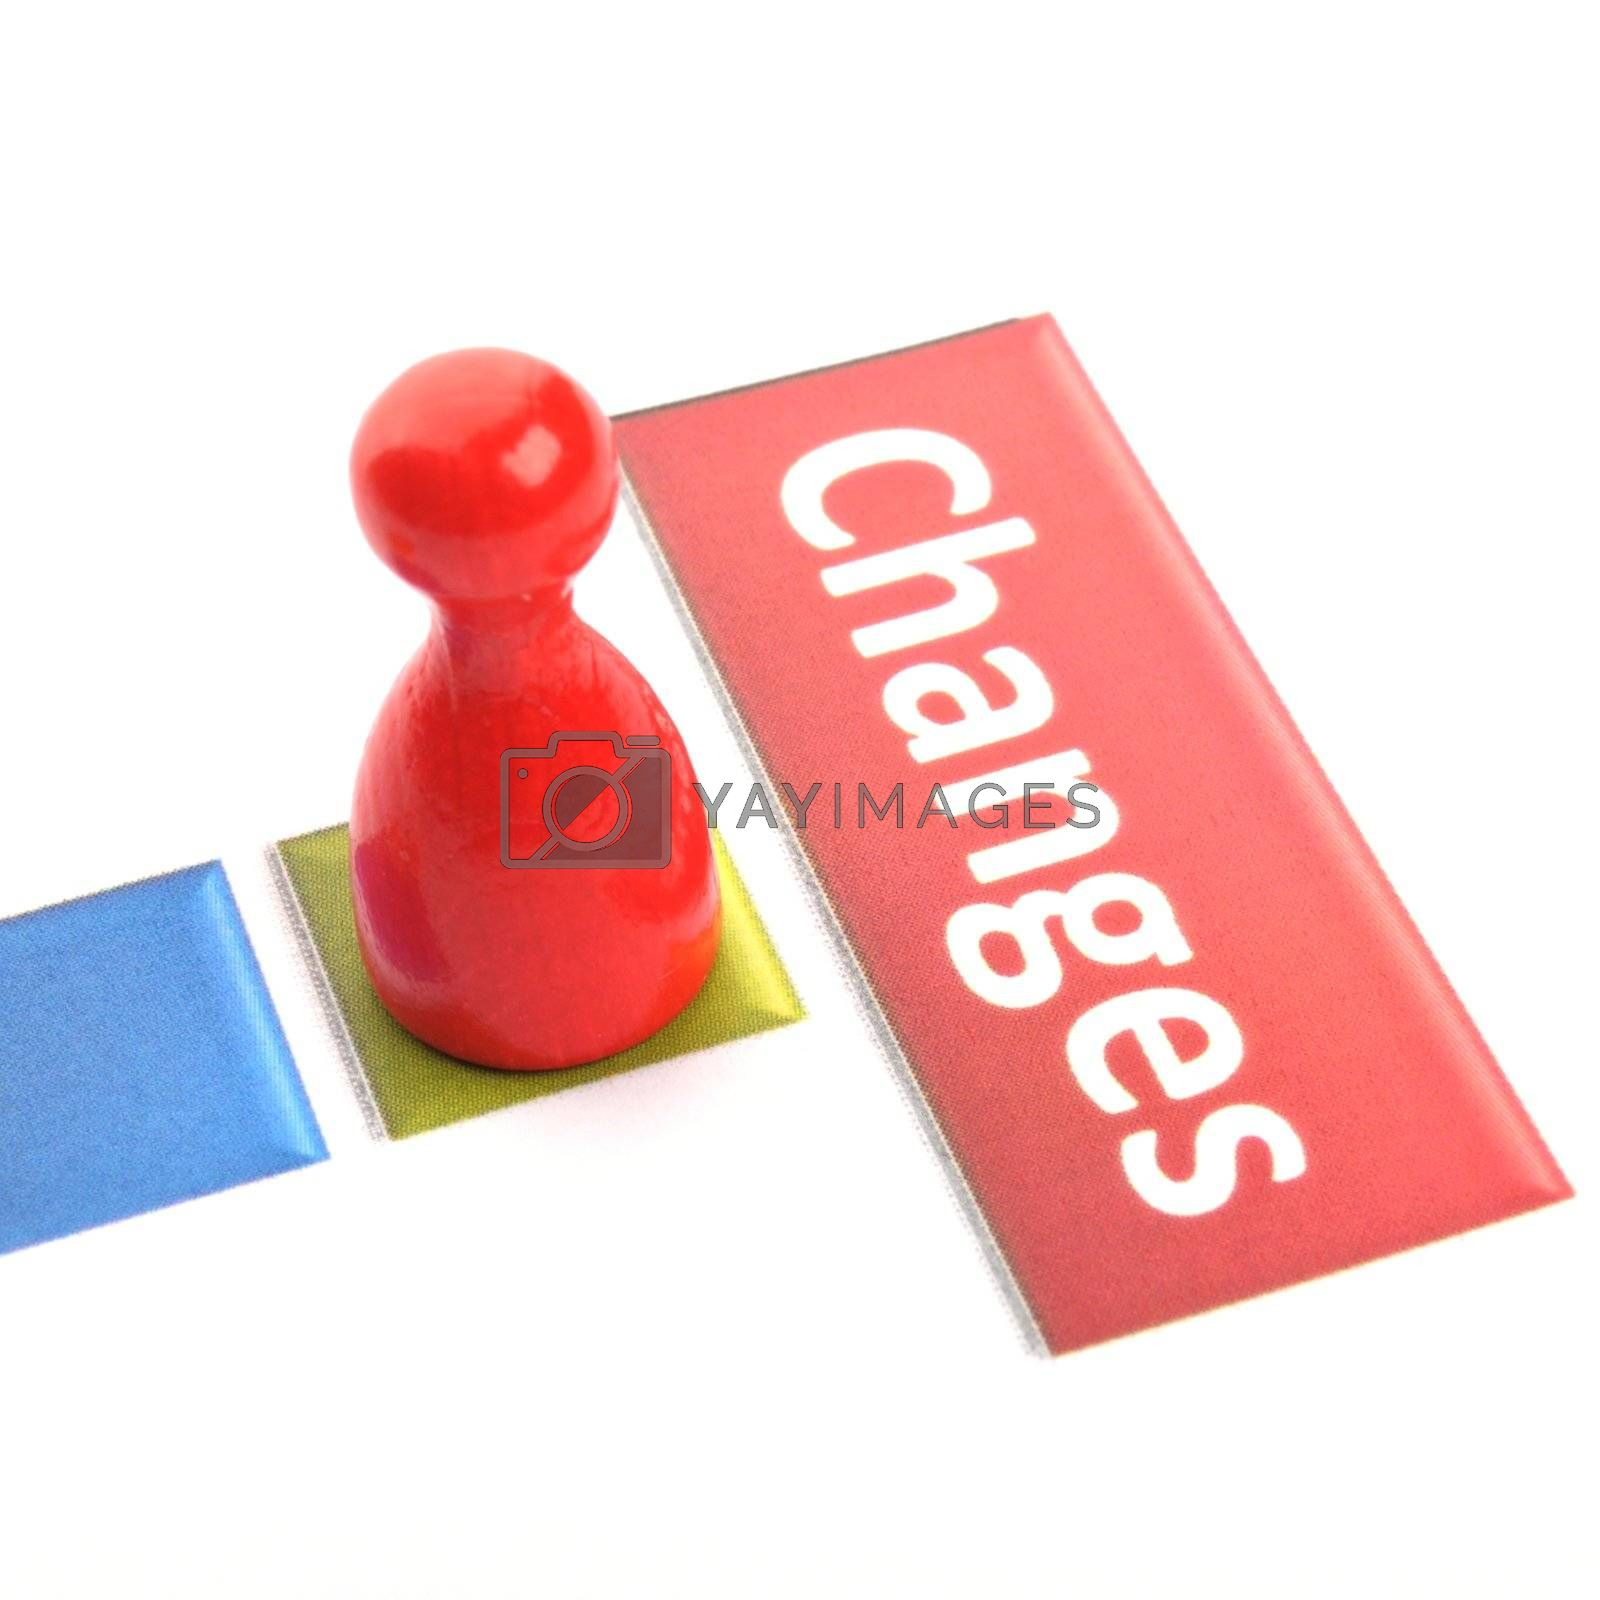 changees by gunnar3000